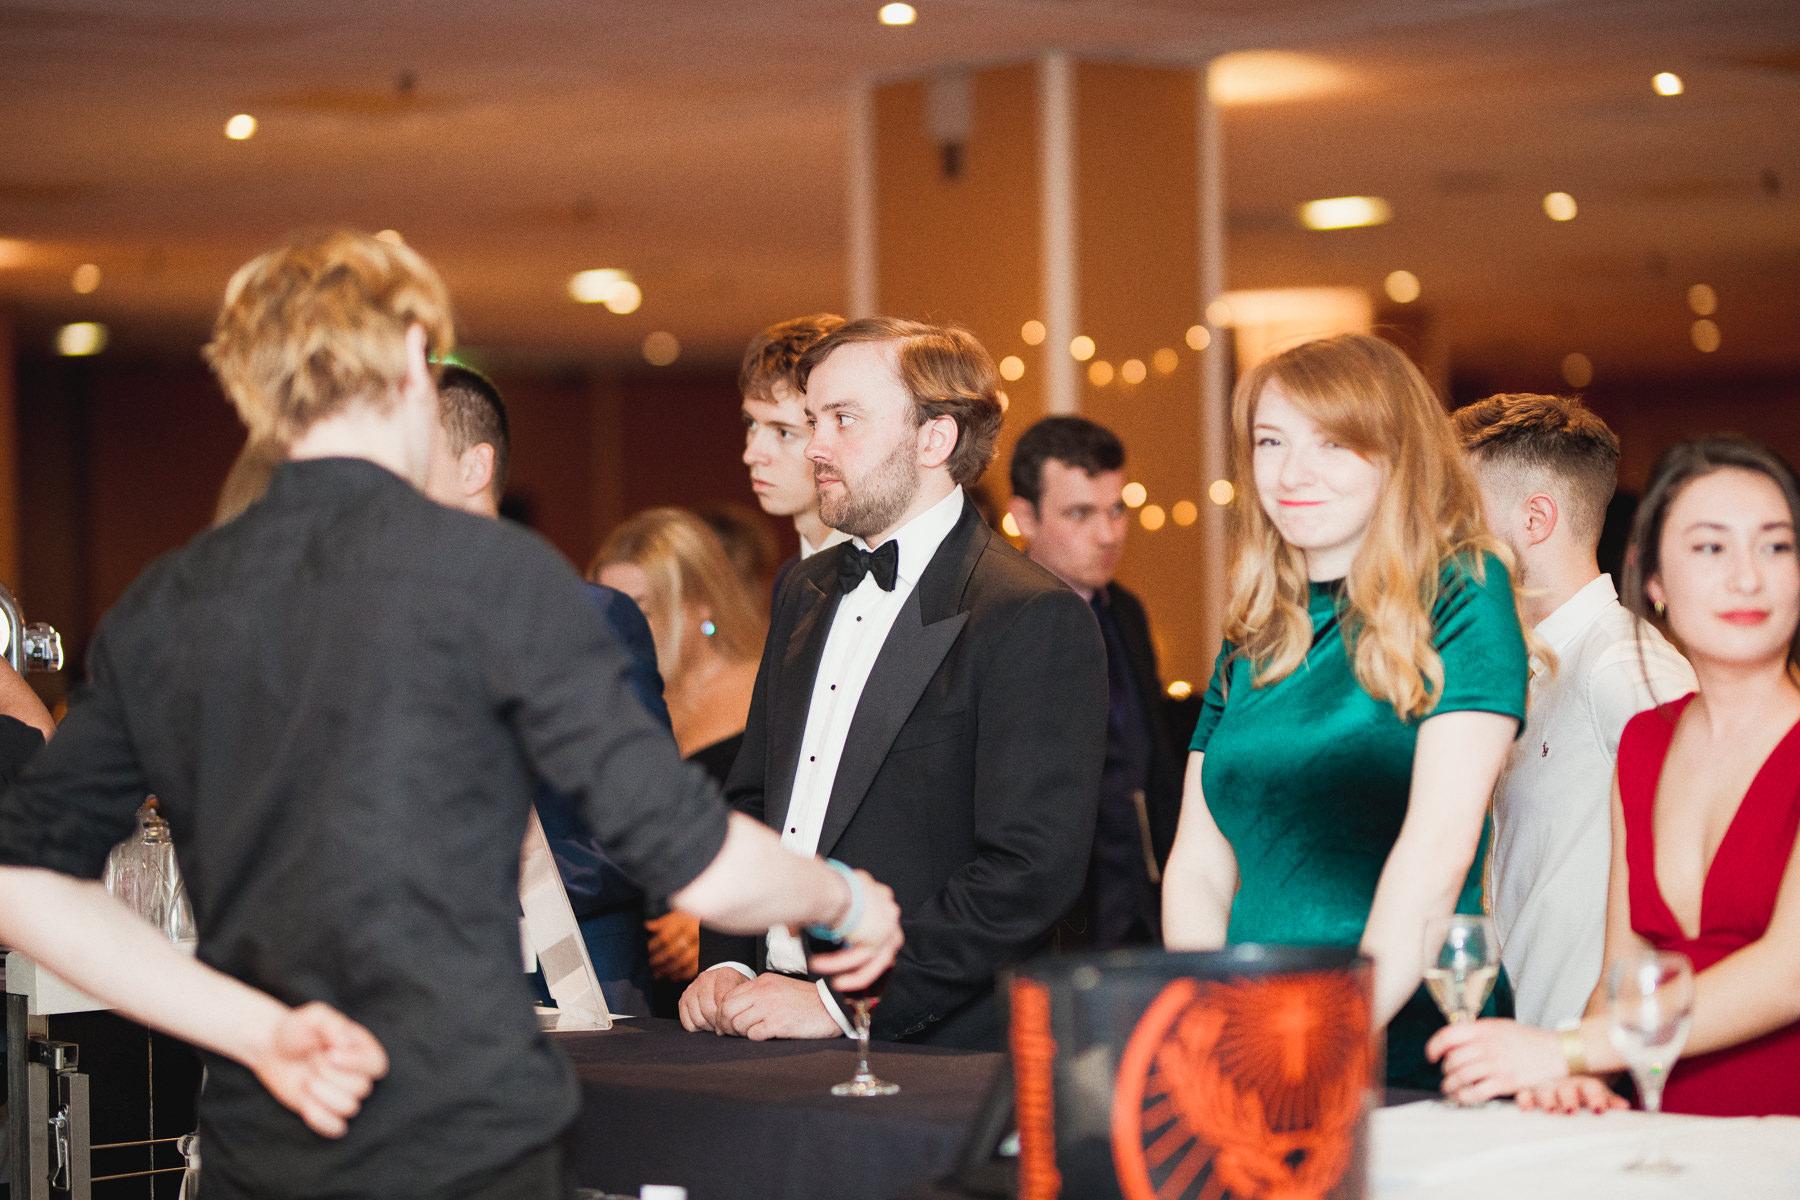 Sussex Broadway Ball Ieva Vilcinskaite Brighton Event Photographer 4.jpg